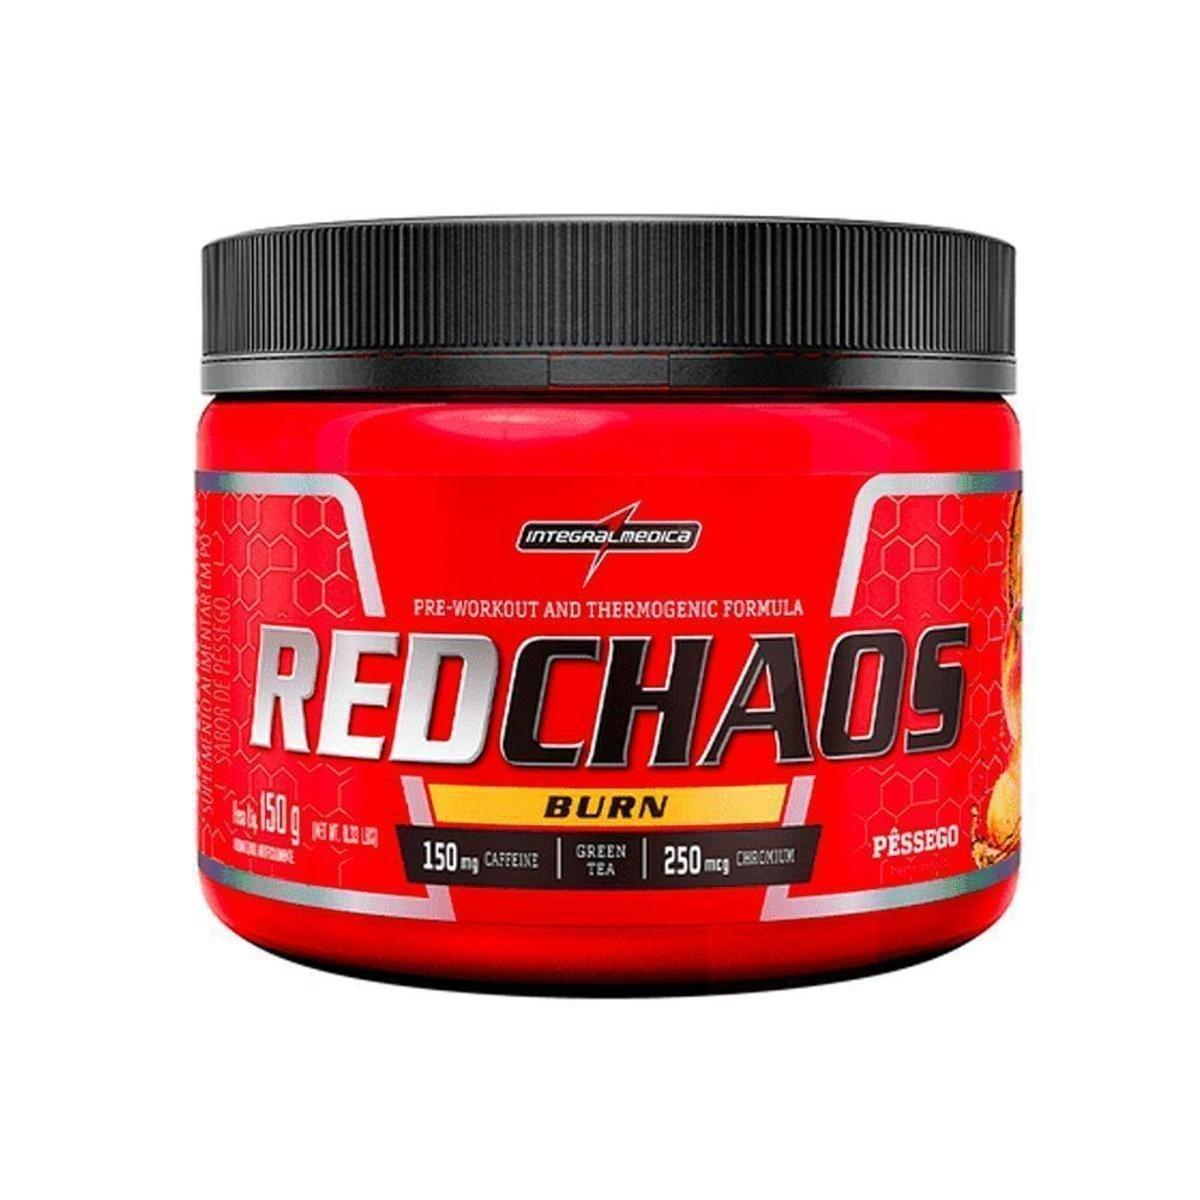 RED CHAOS BURN | 150G | PÊSSEGO | INTEGRALMEDICA